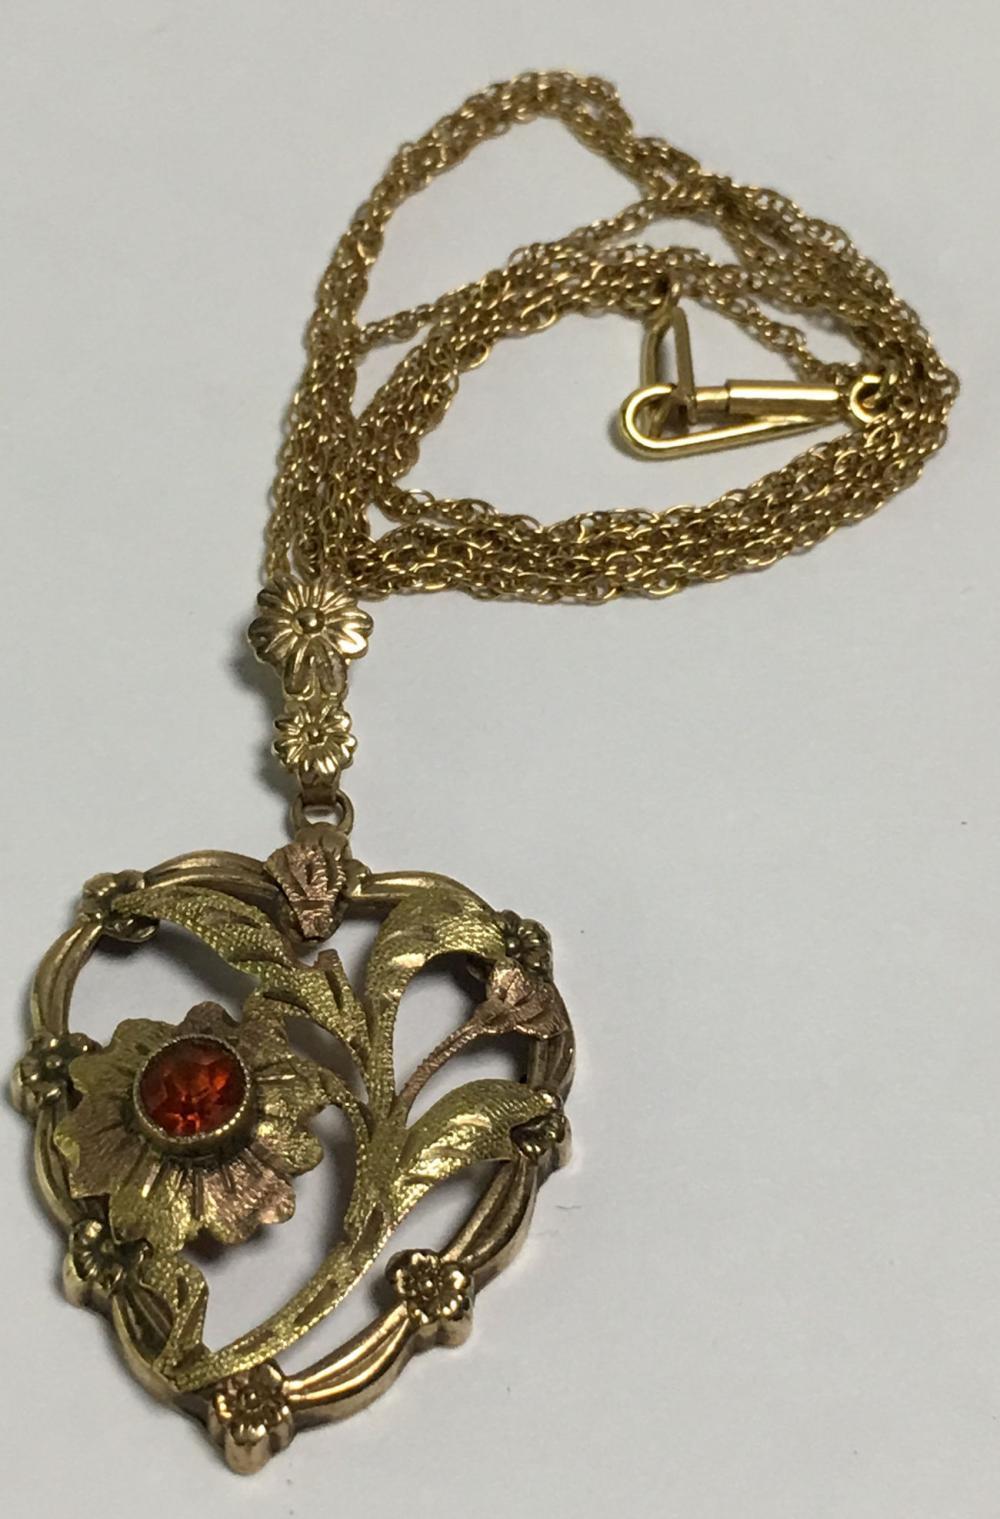 10k Gold Garnet Heart Pendant Necklace